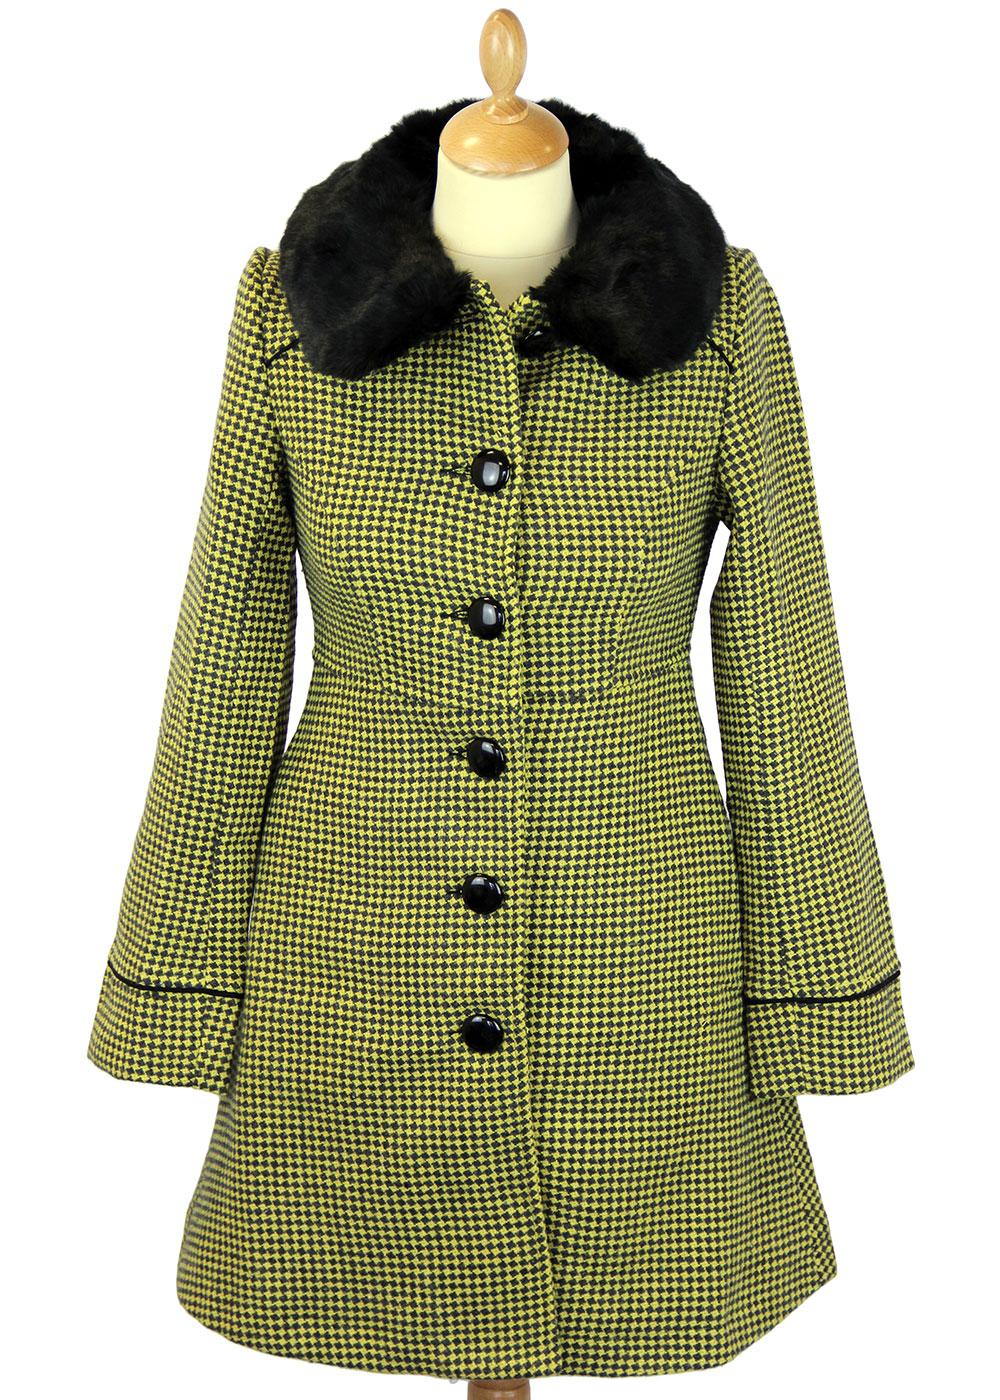 Tammy FRIDAY ON MY MIND Retro Jacquard Knit Coat Y